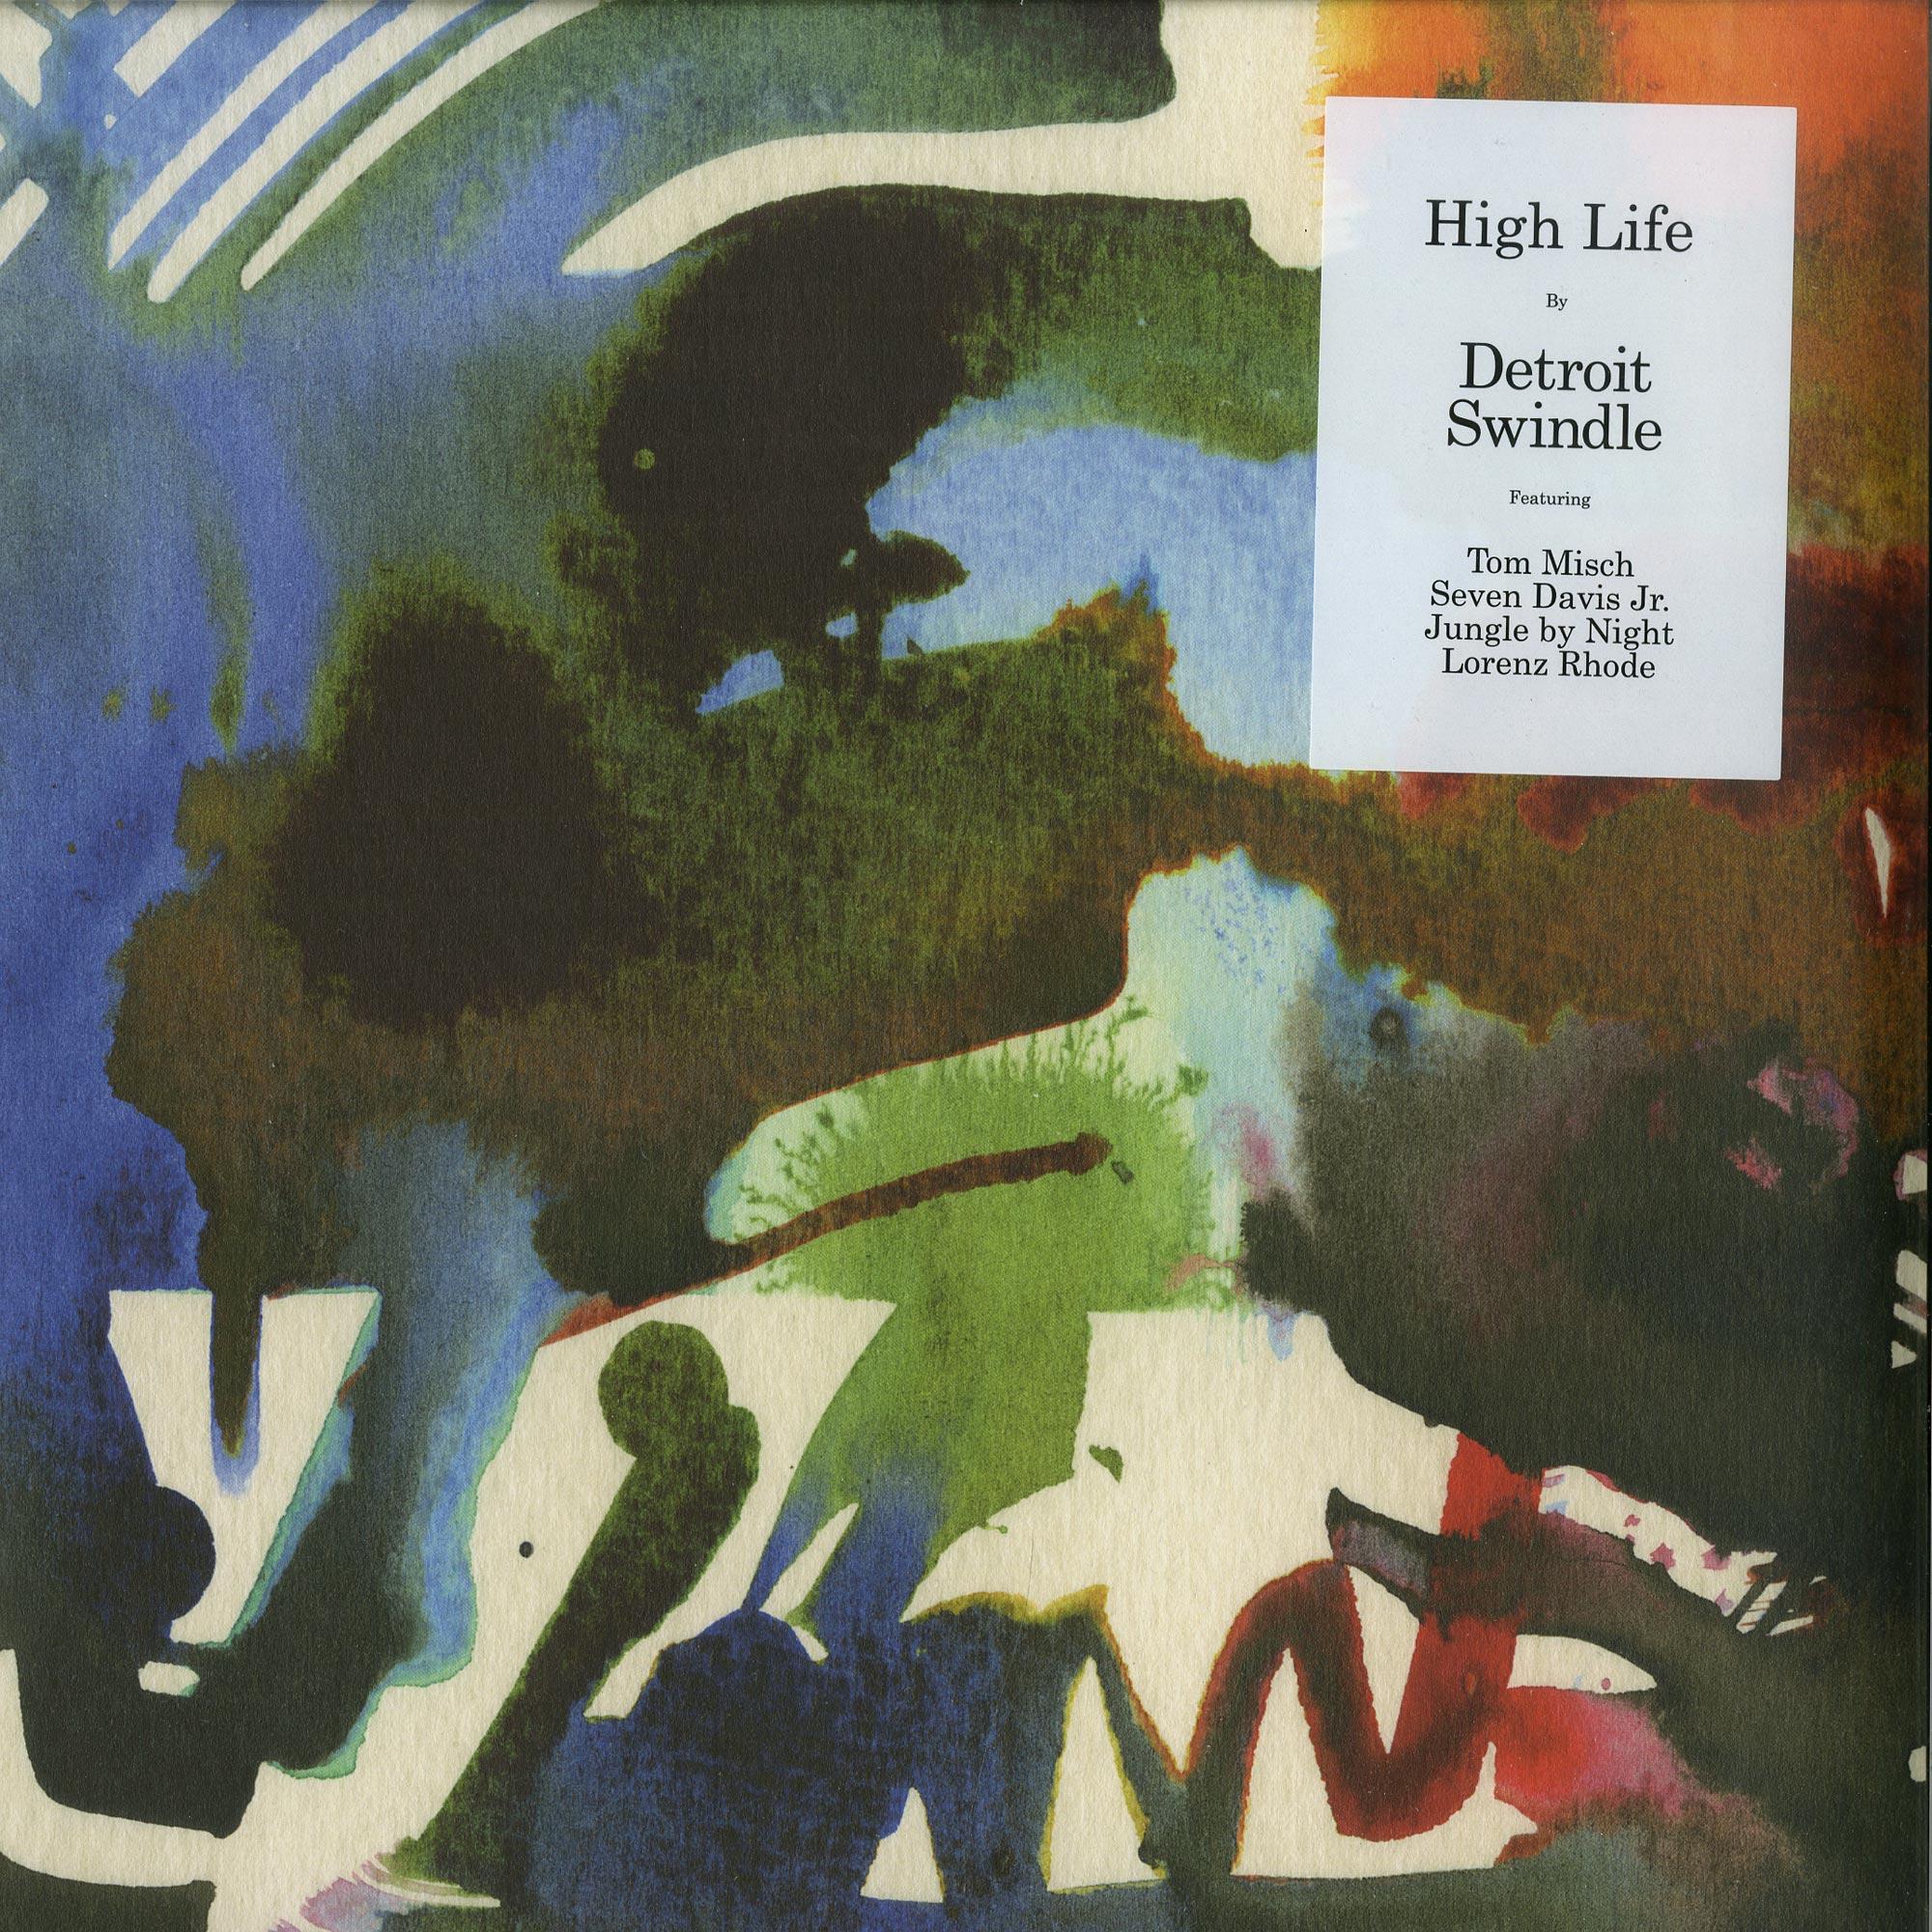 Detroit Swindle - HIGH LIFE